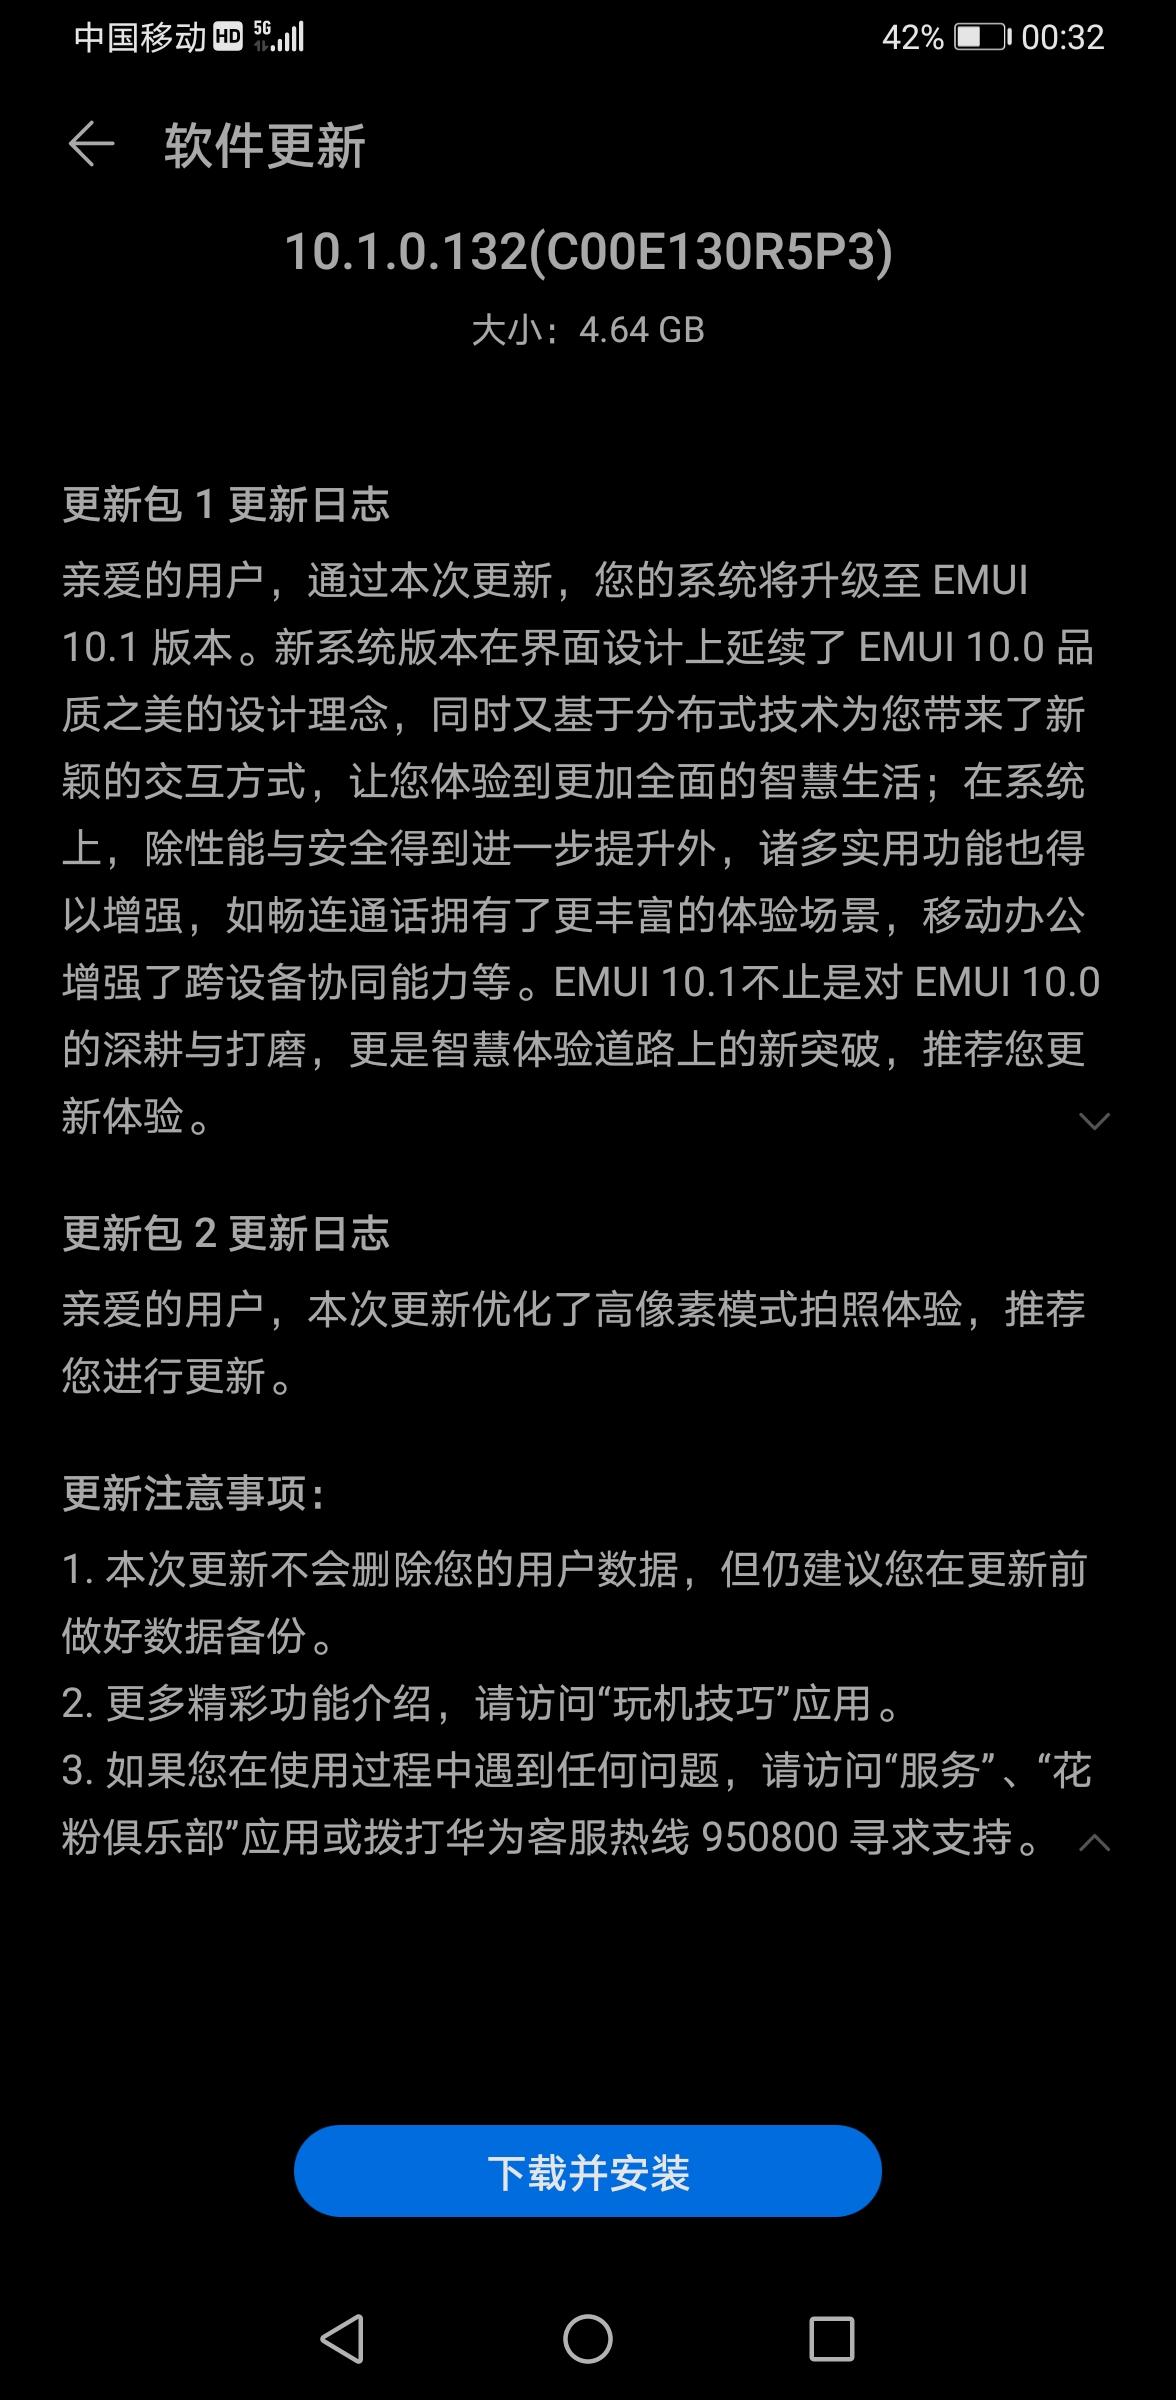 Screenshot_20200516_003247_com.huawei.android.hwouc.jpg